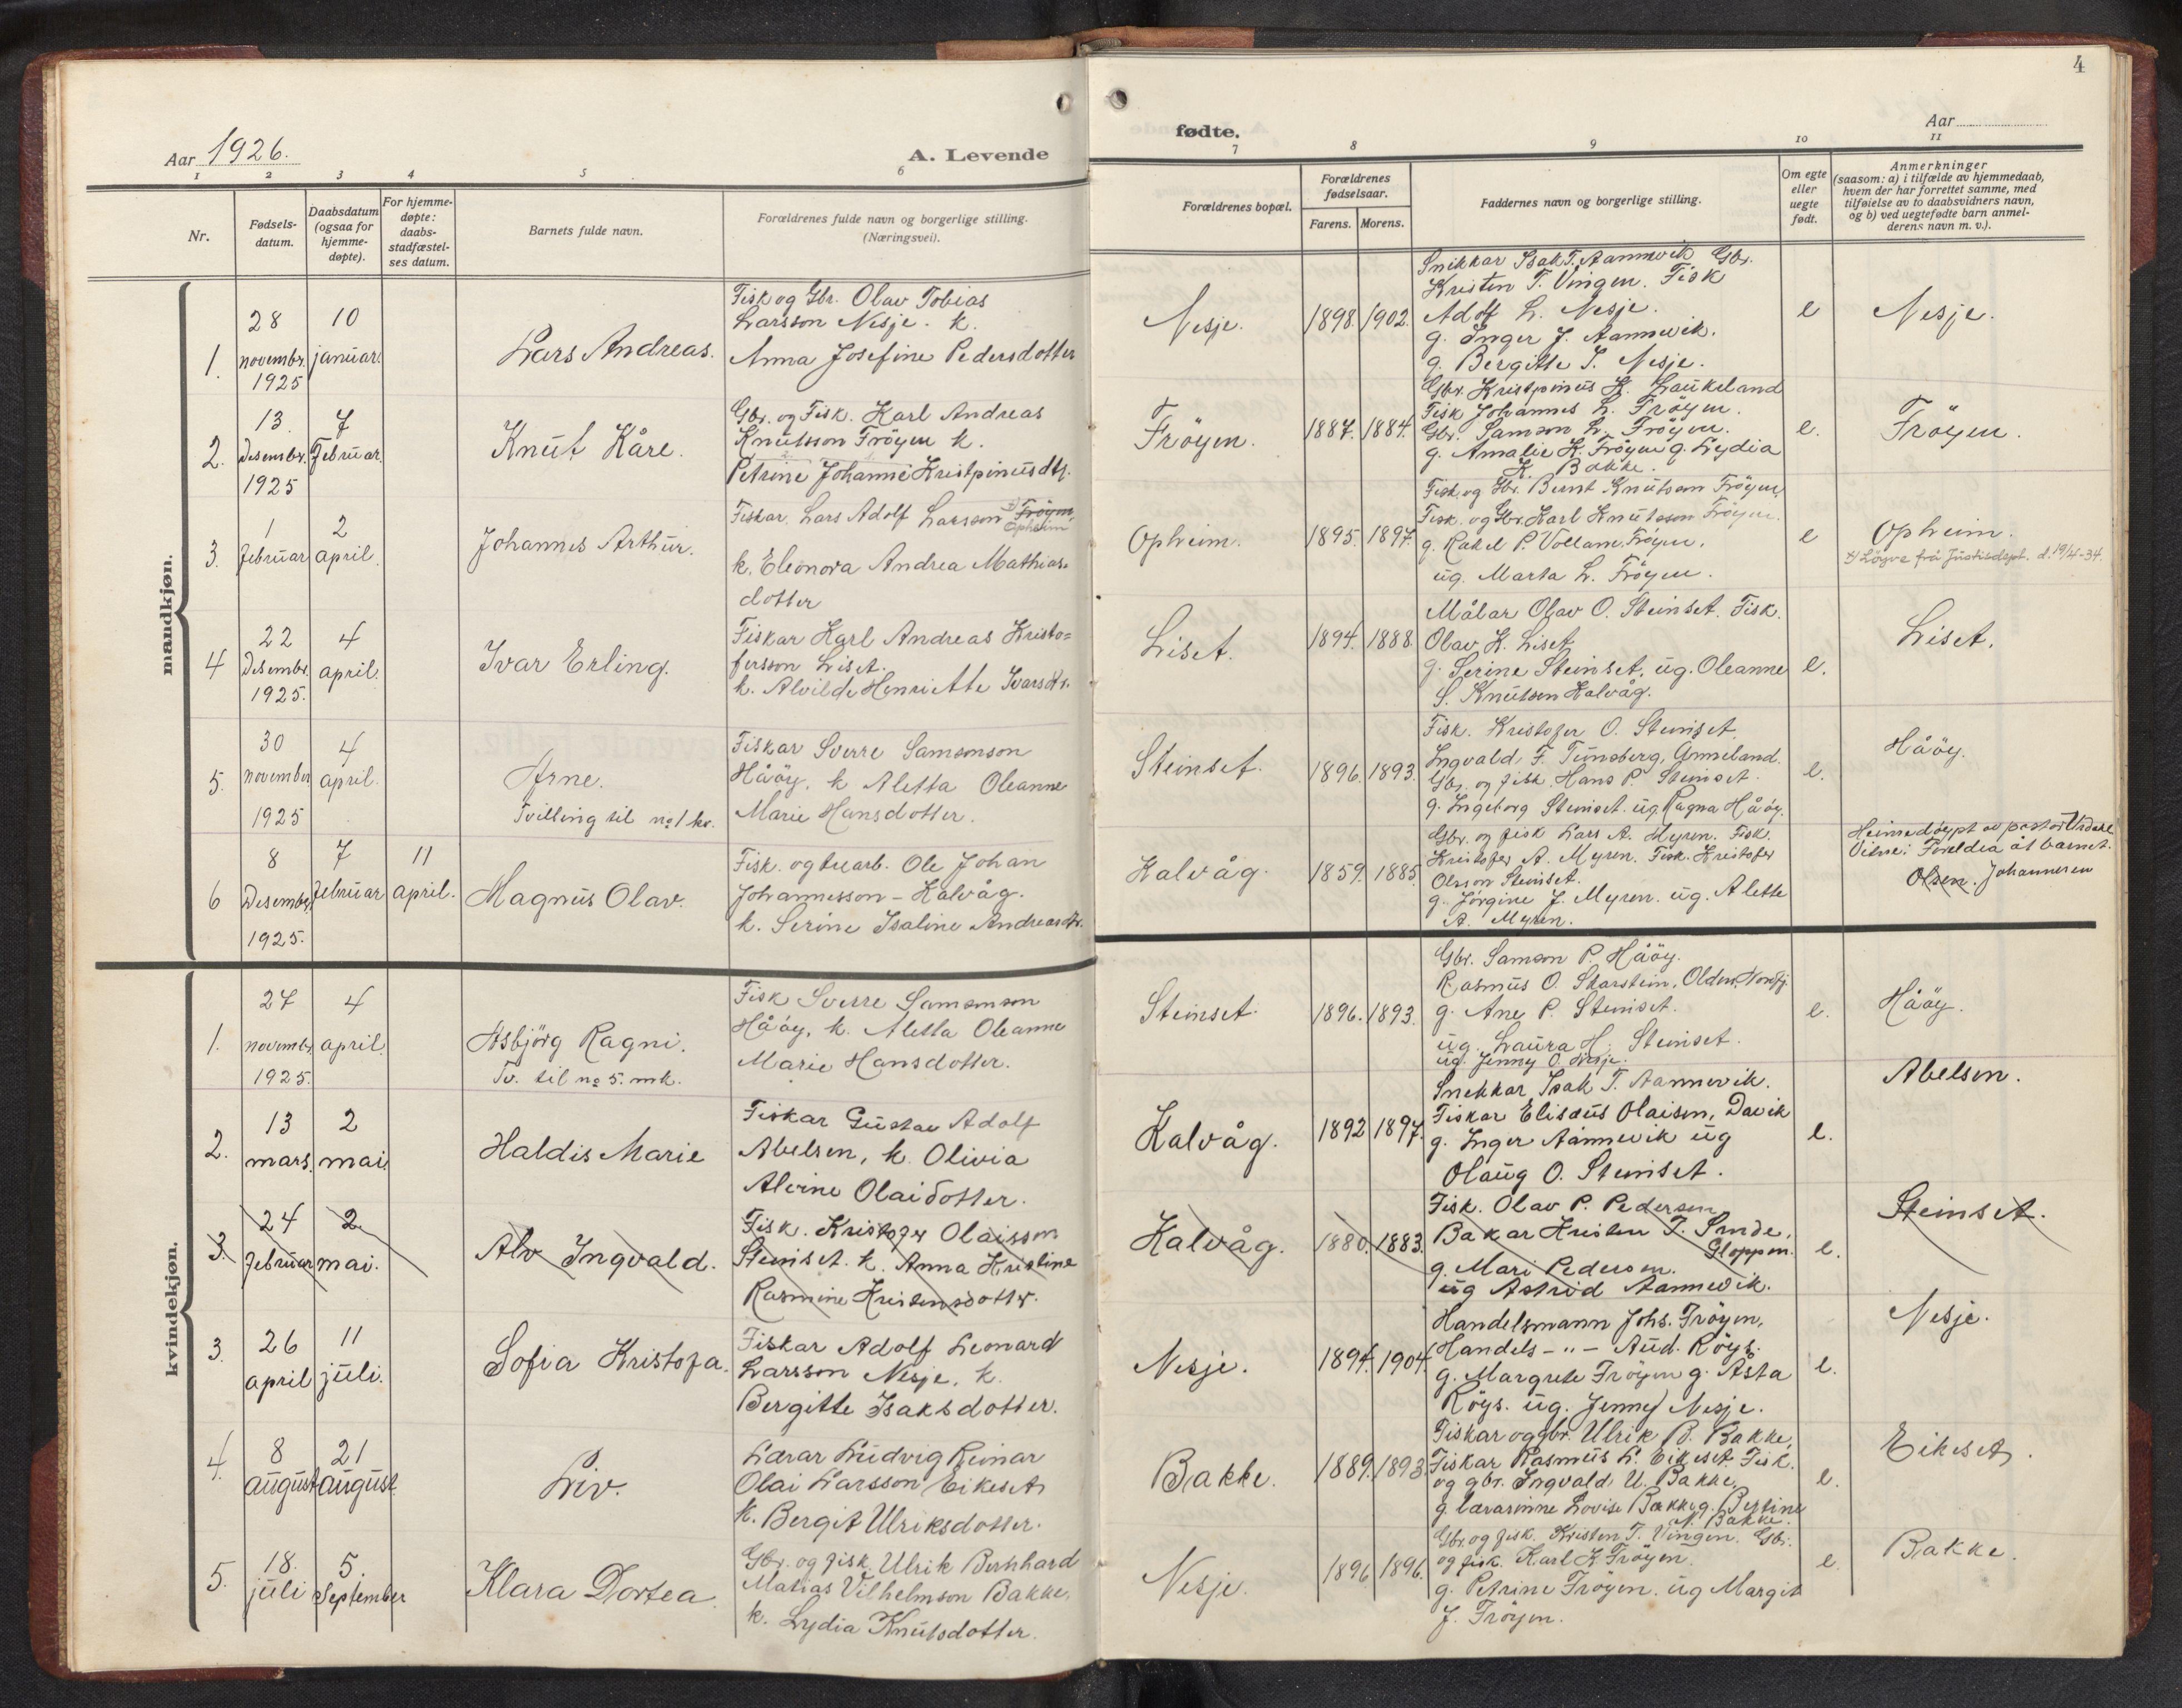 SAB, Bremanger Sokneprestembete, H/Hab: Klokkerbok nr. B 2, 1926-1945, s. 3b-4a